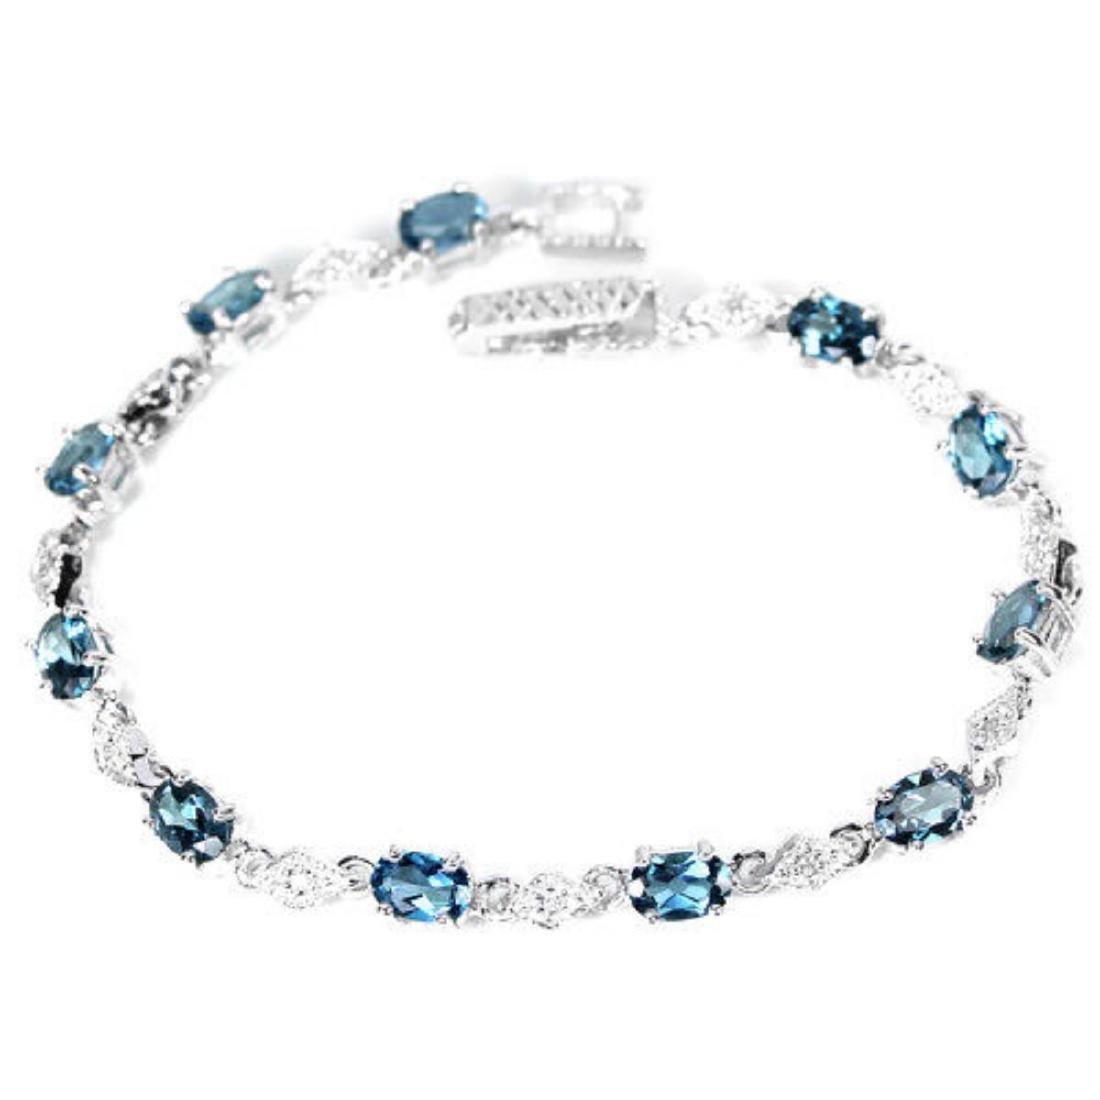 Natural AAA LONDON BLUE TOPAZ  Bracelet